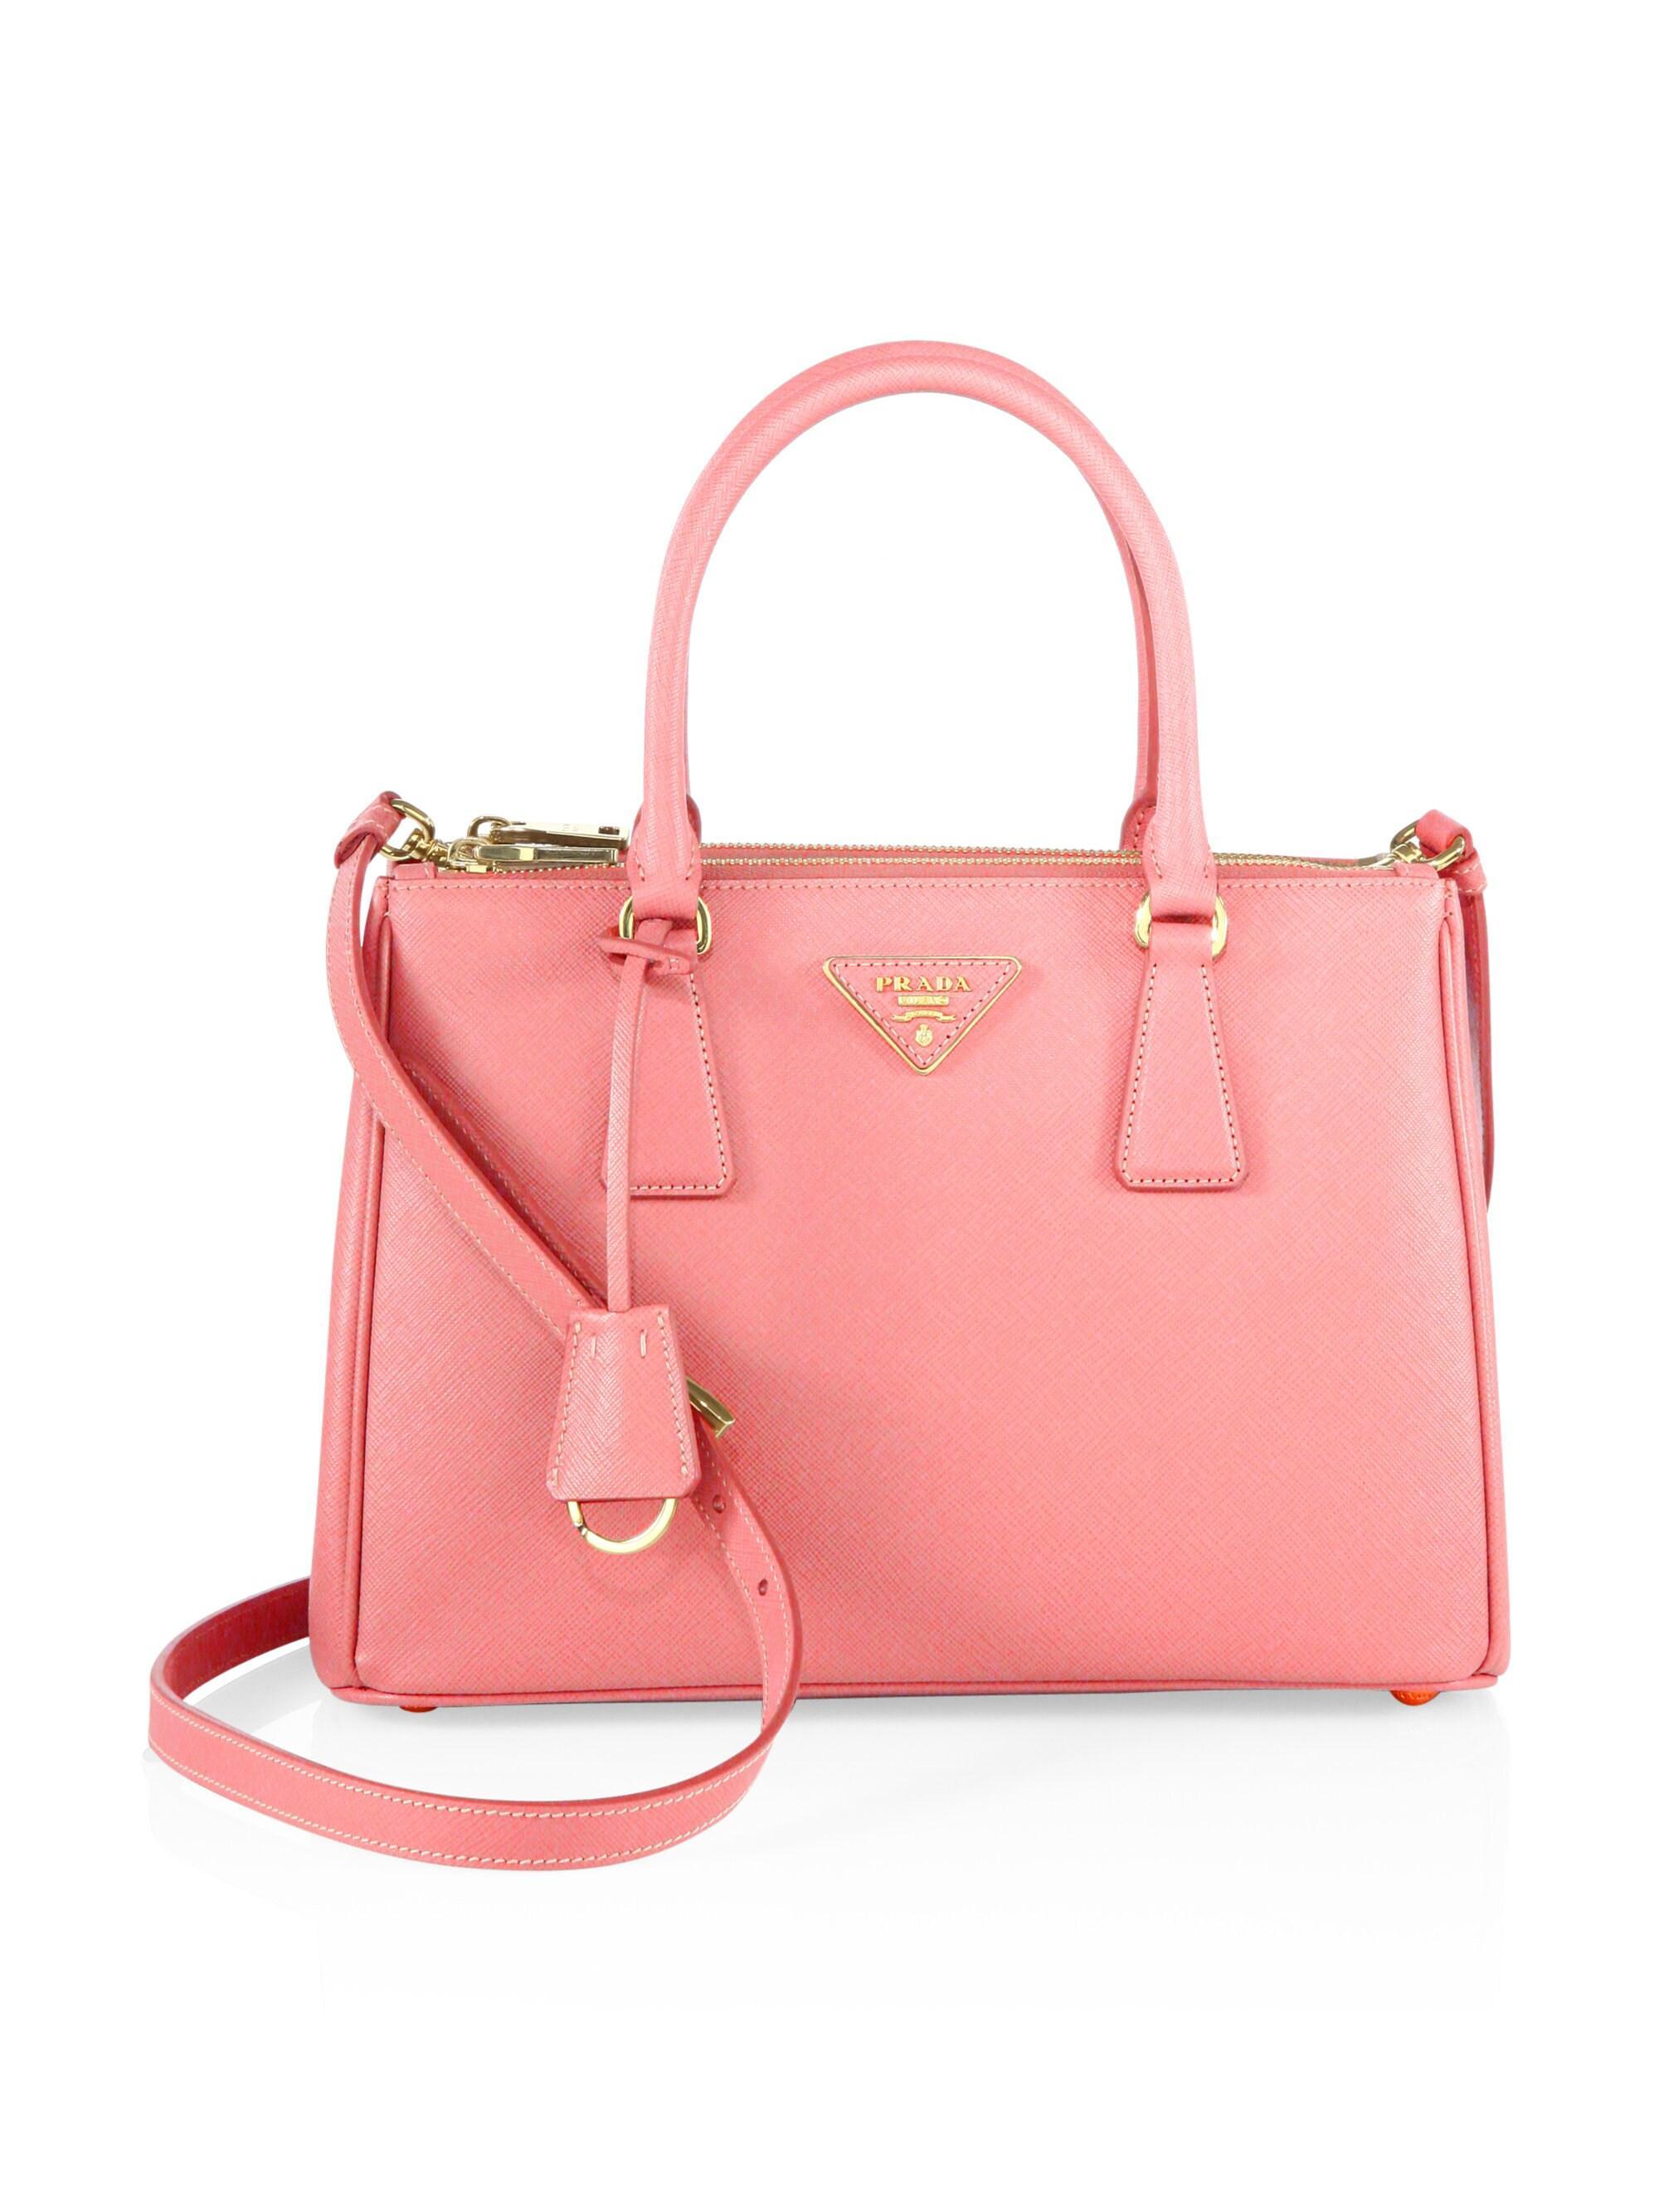 c5c9c90efc61 Prada. Pink Women's Small Galleria Tote - Black. $2,350 From Saks Fifth  Avenue